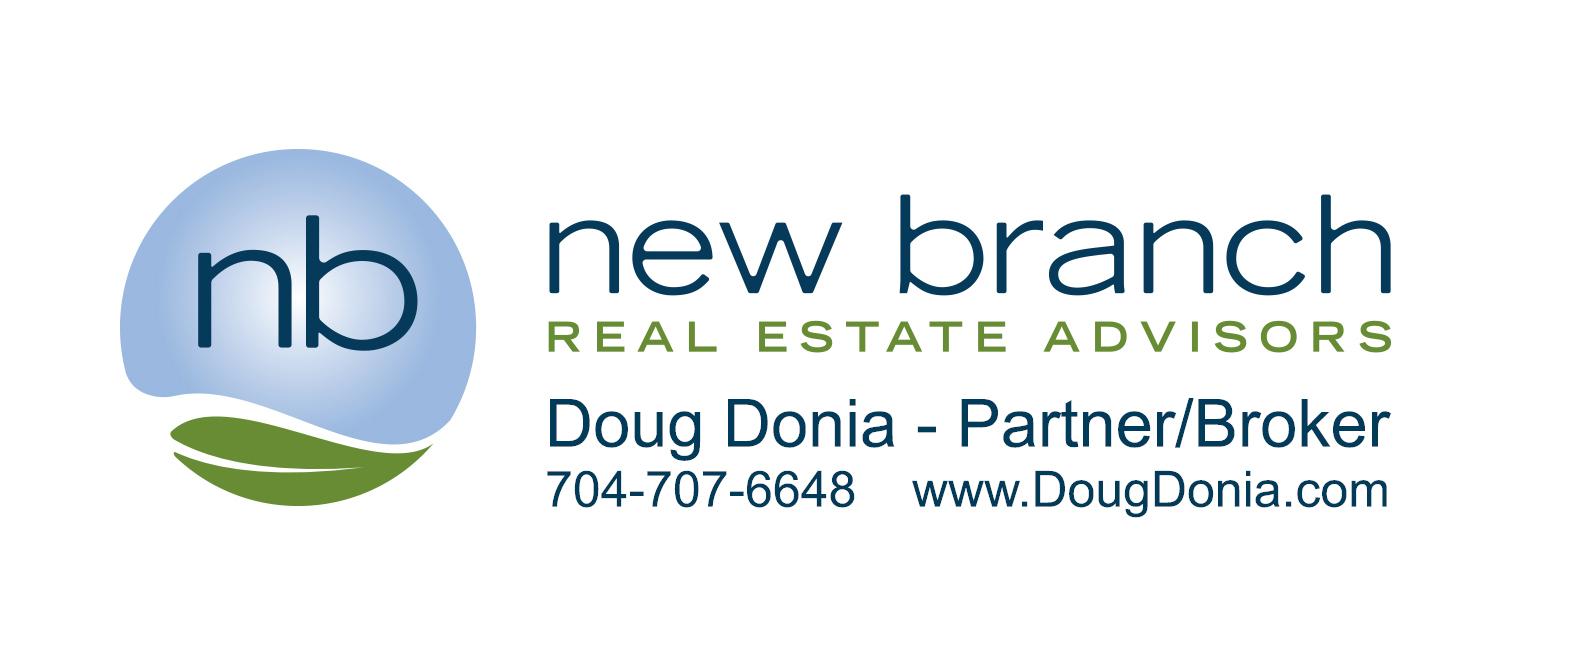 Doug Donia